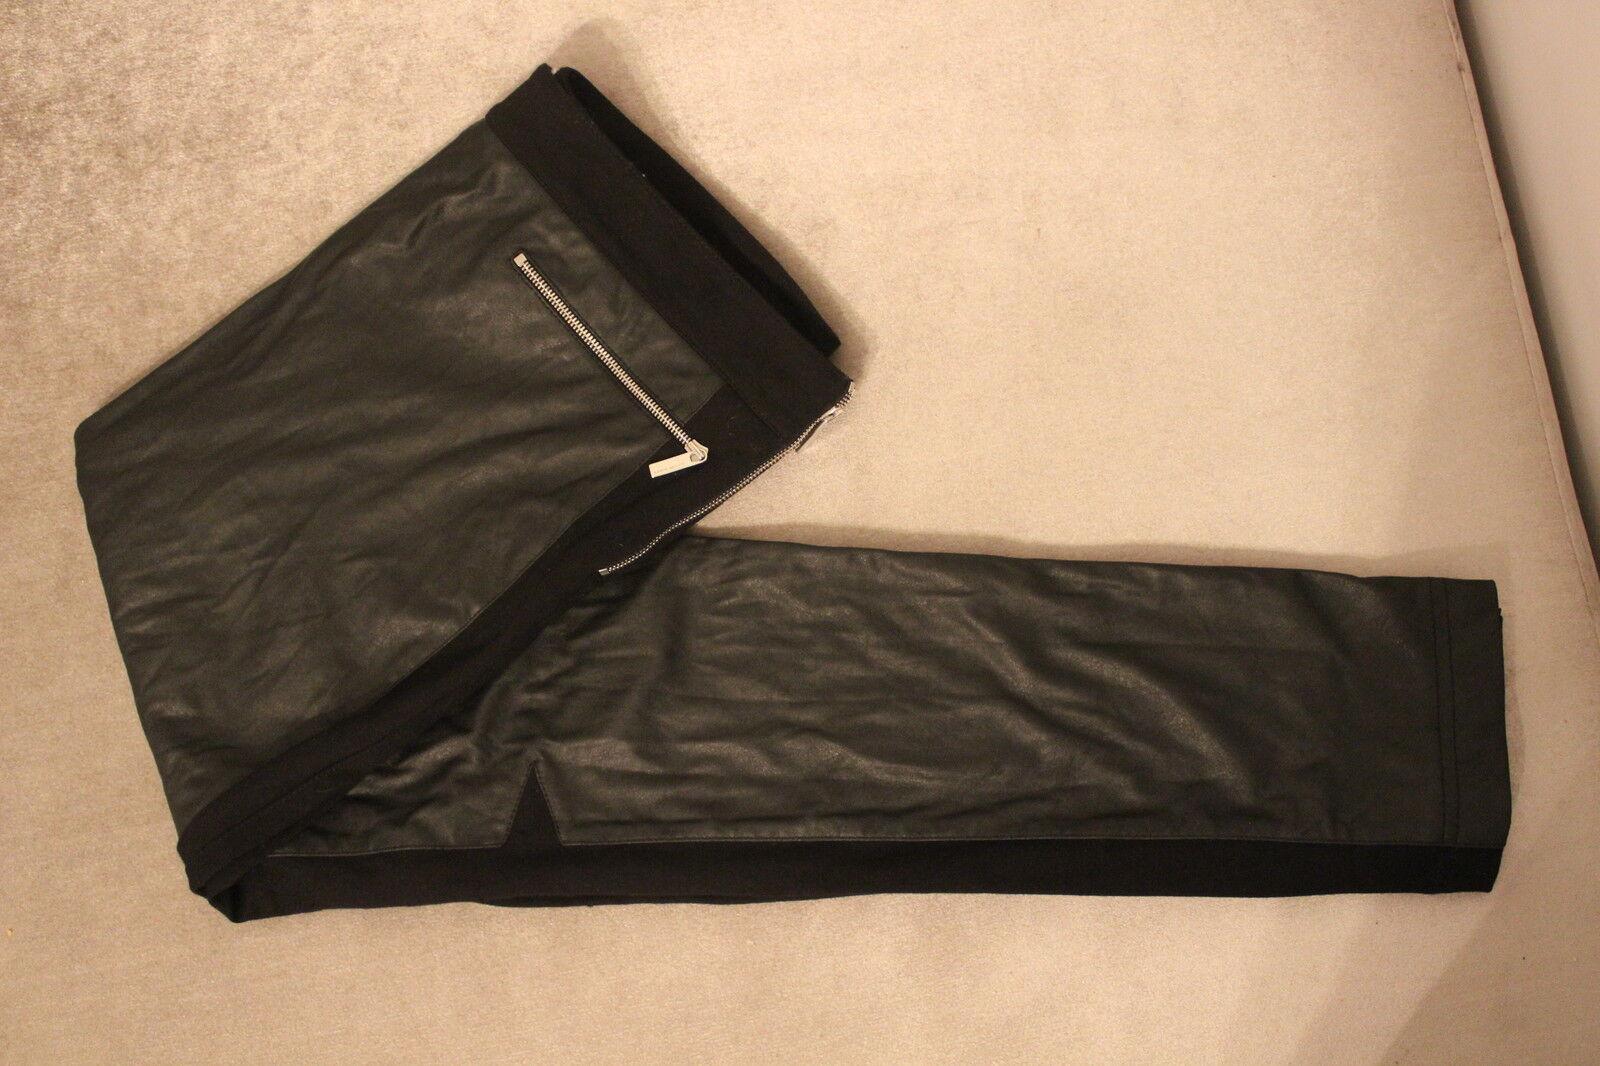 Karen Millen skinny tasca con con con zip jeans jeggins PANNELLO Pantaloni Slim Stretch 10 - 12 f28abe